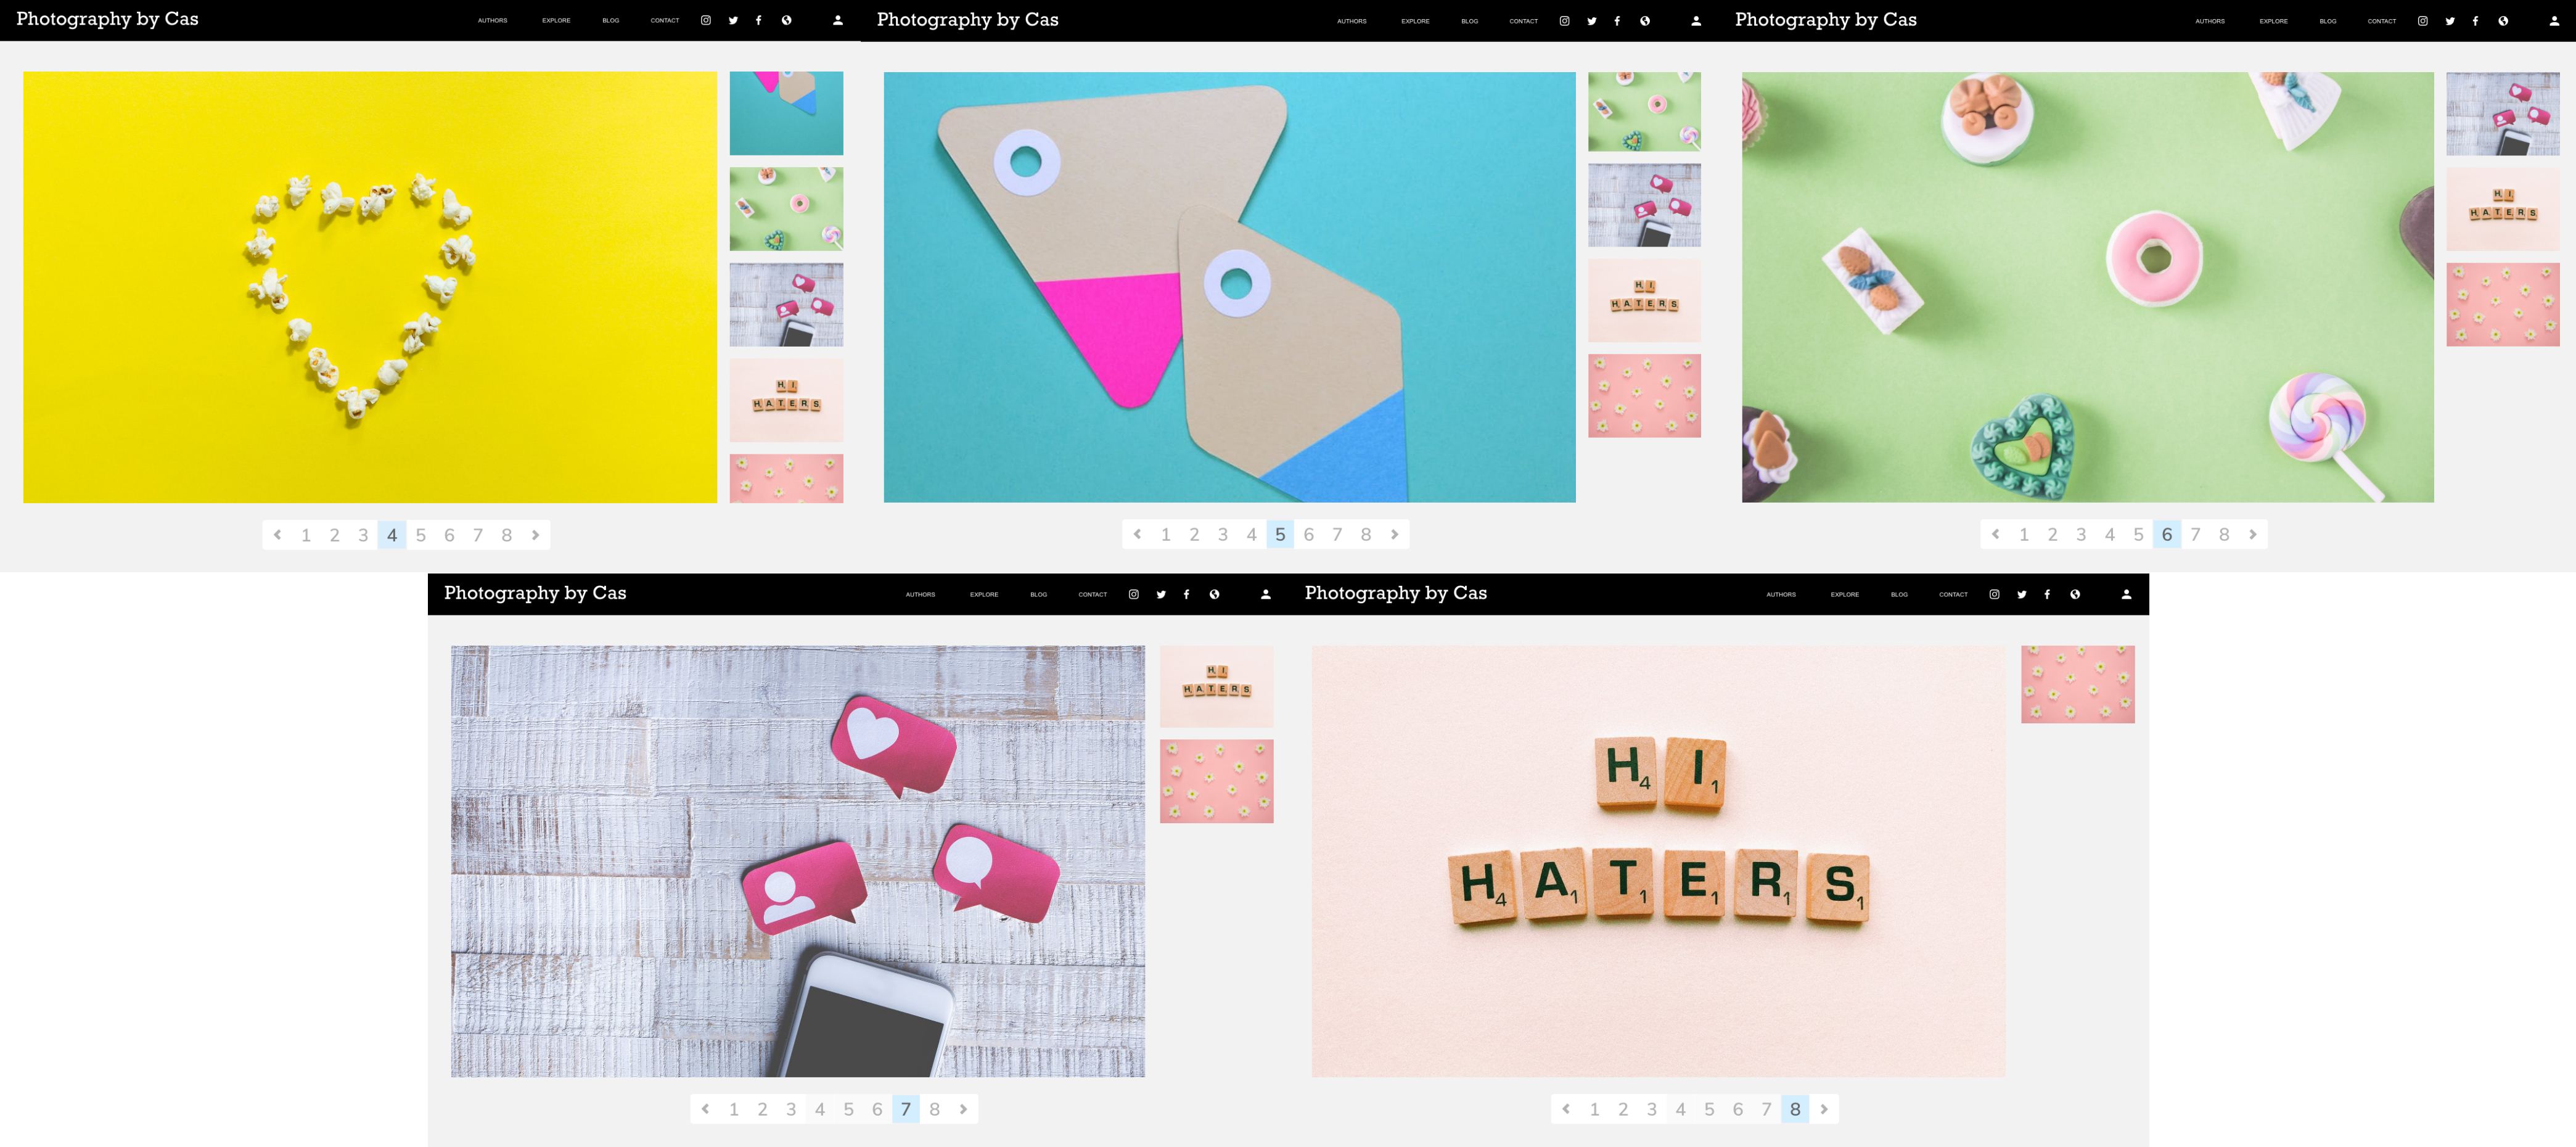 Adobe XD Design Challenge Projects